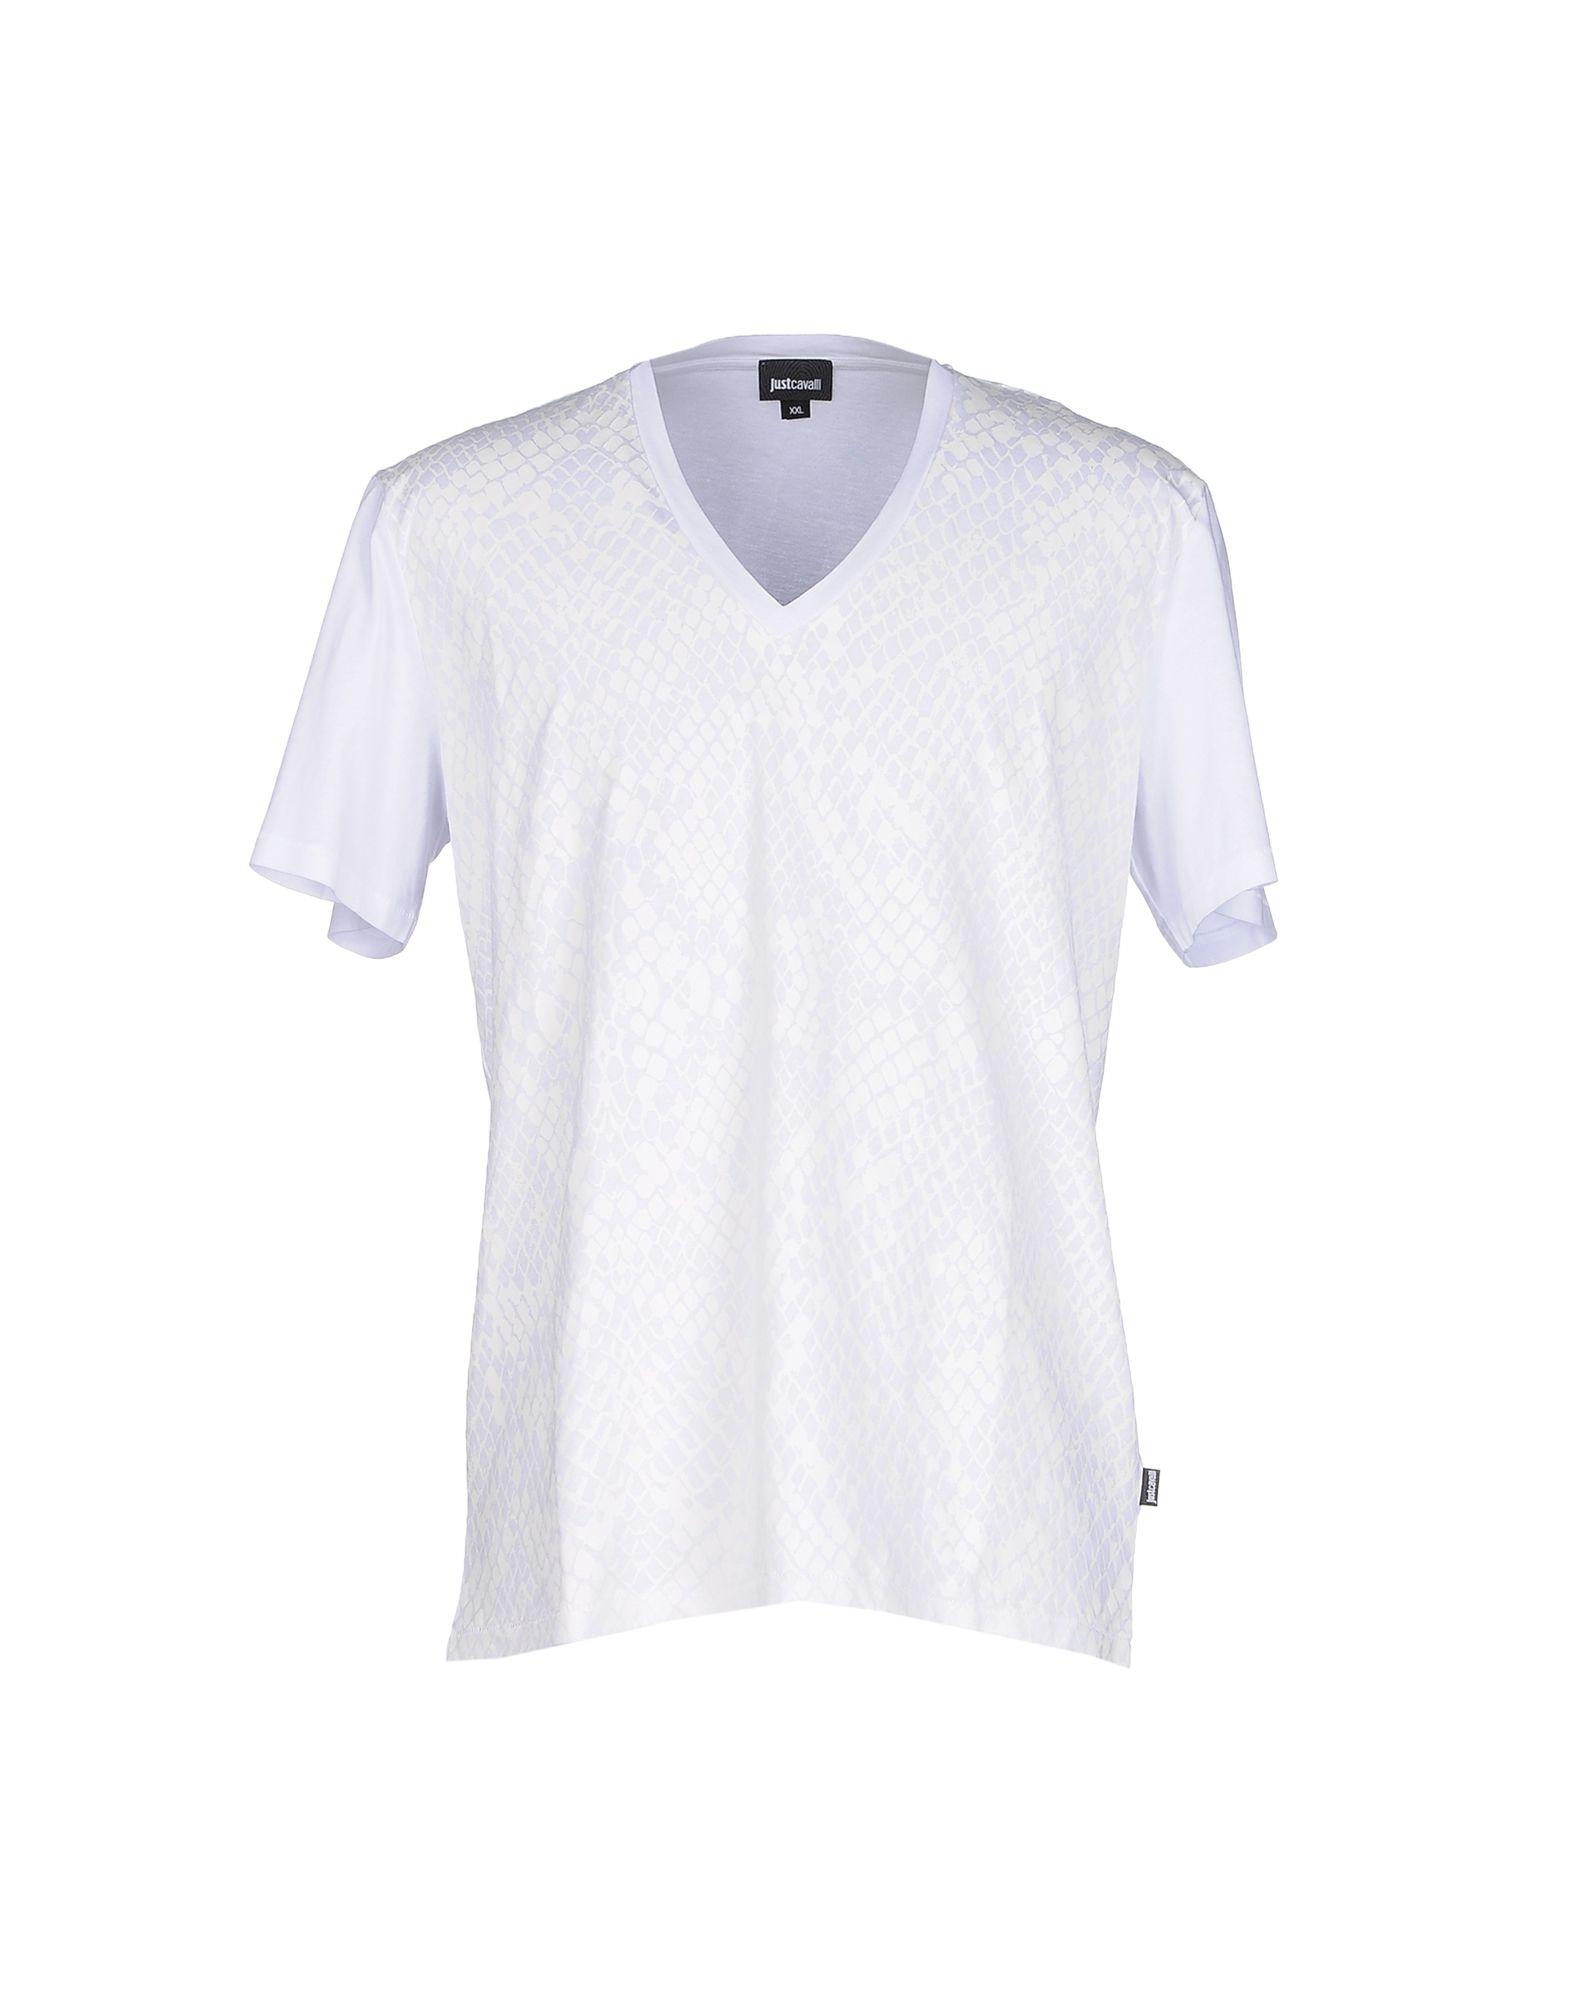 JUST CAVALLI Футболка футболка just cavalli футболка